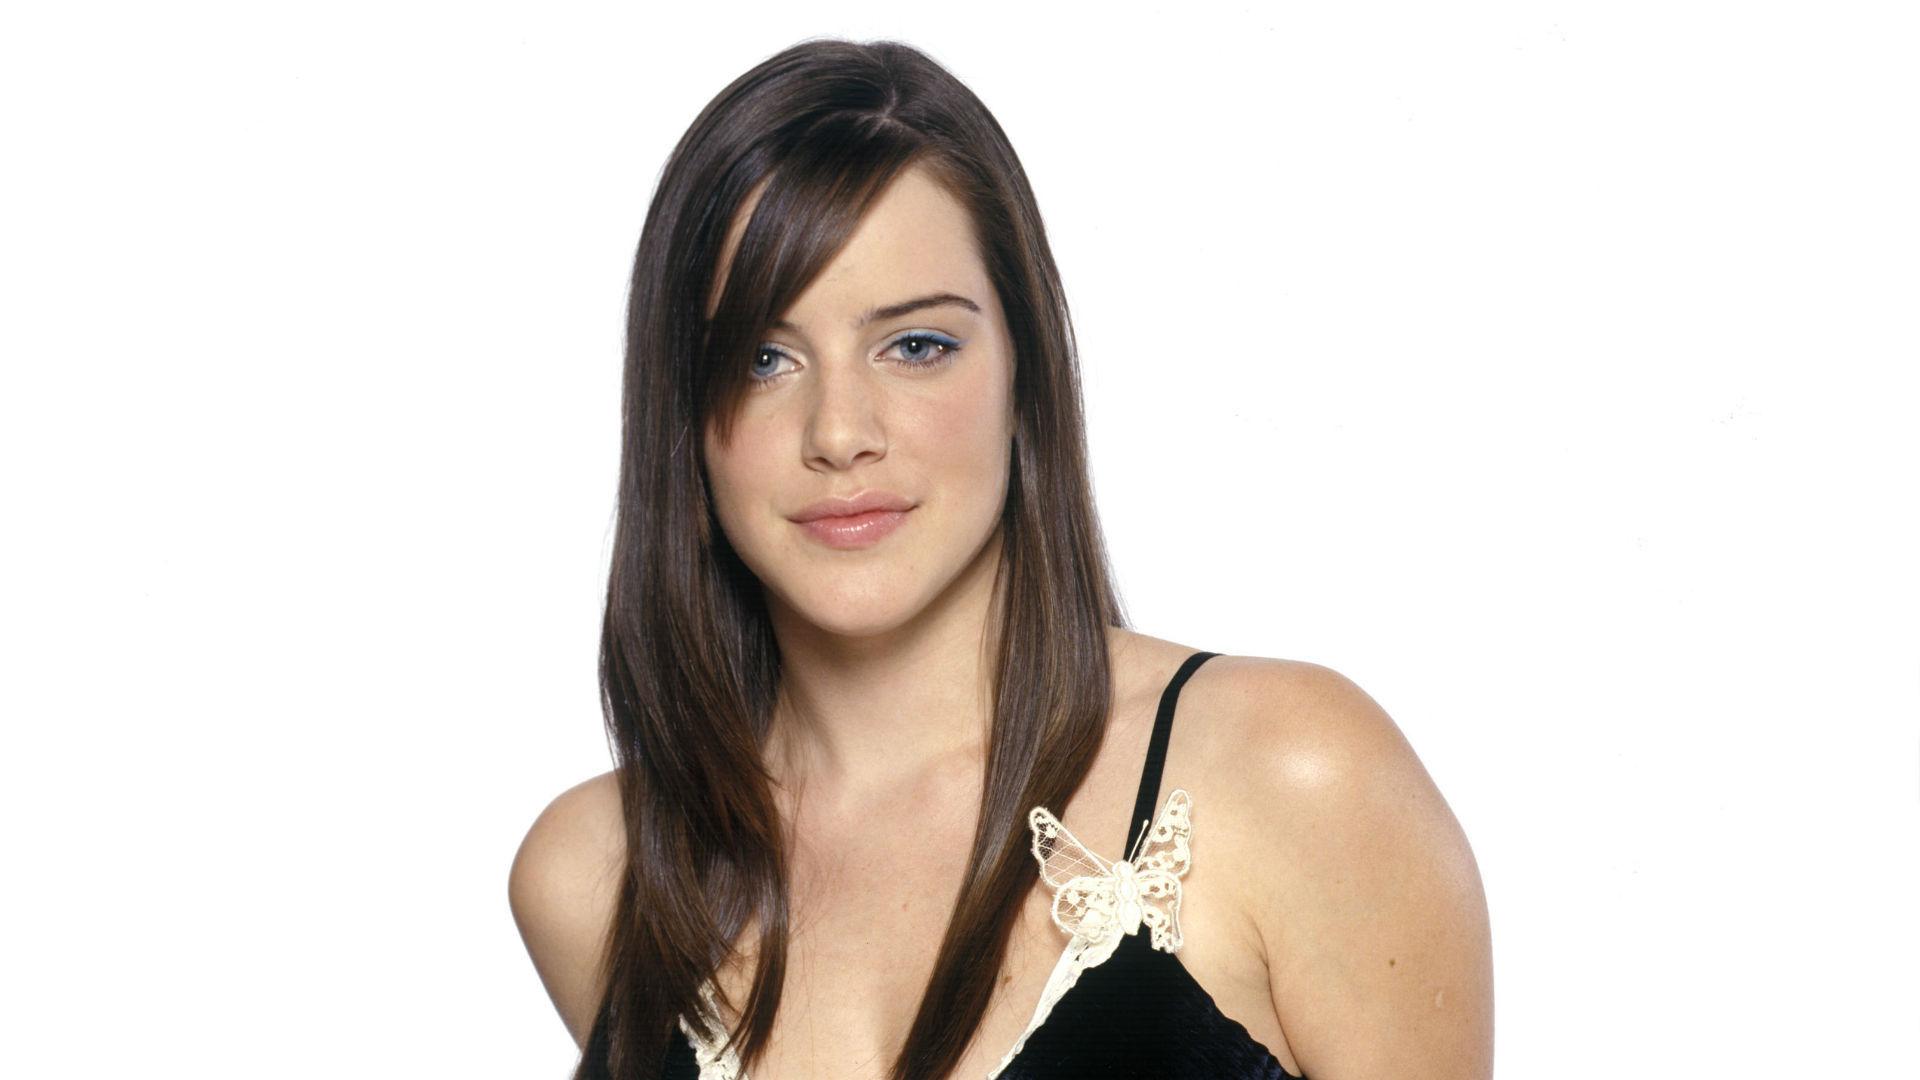 Michelle Ryan Widescreen